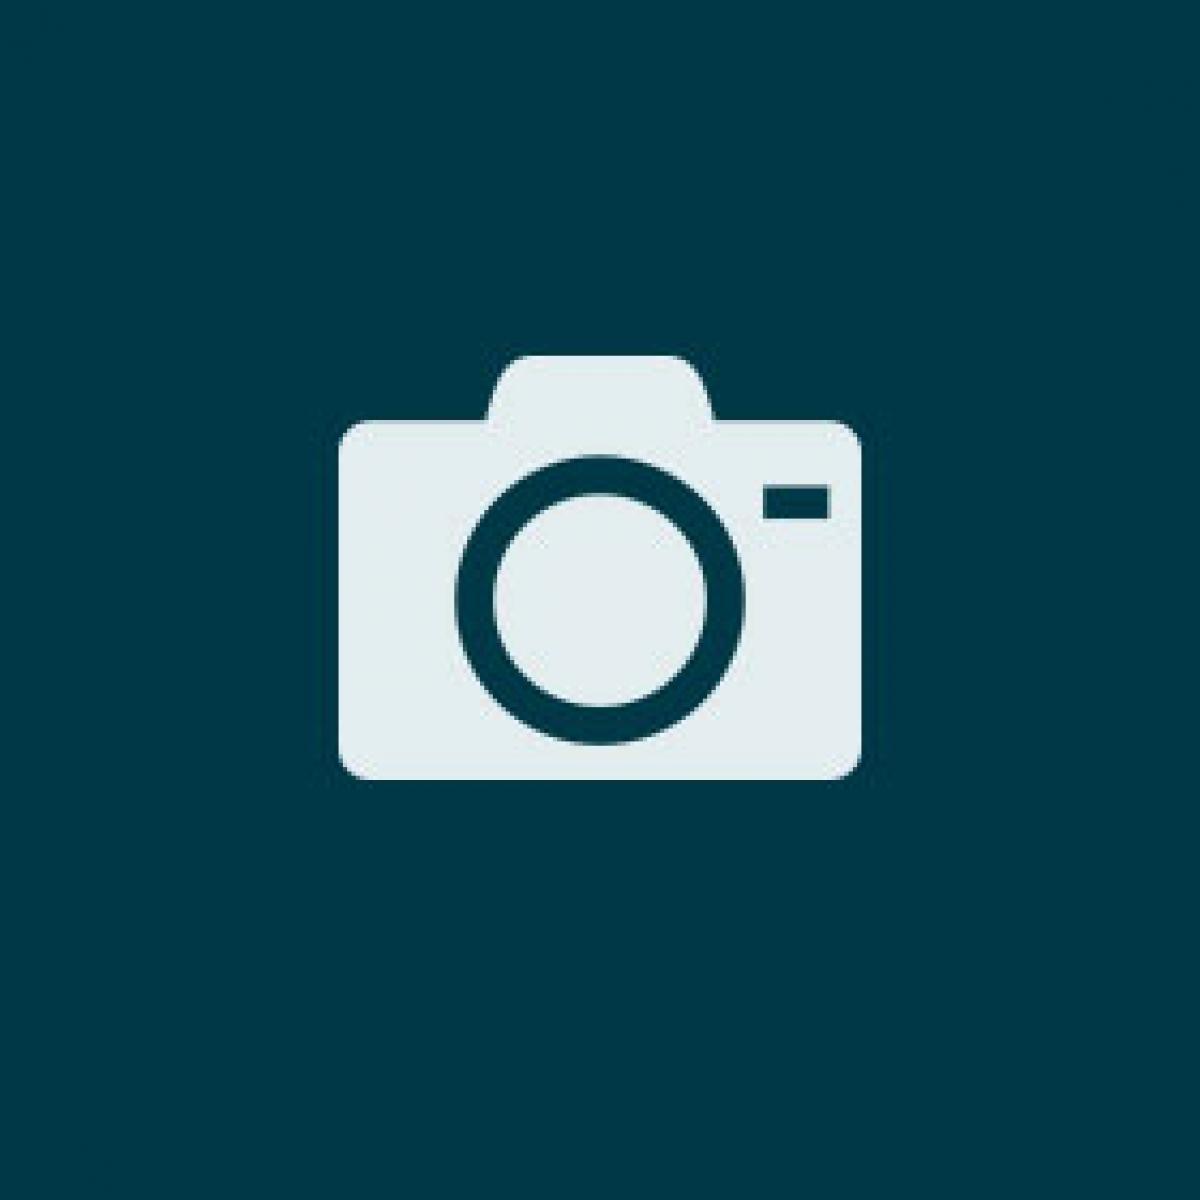 Armitage shanks bathroom sinks - Armitage Shanks Portman 21 Wall Hung Basin